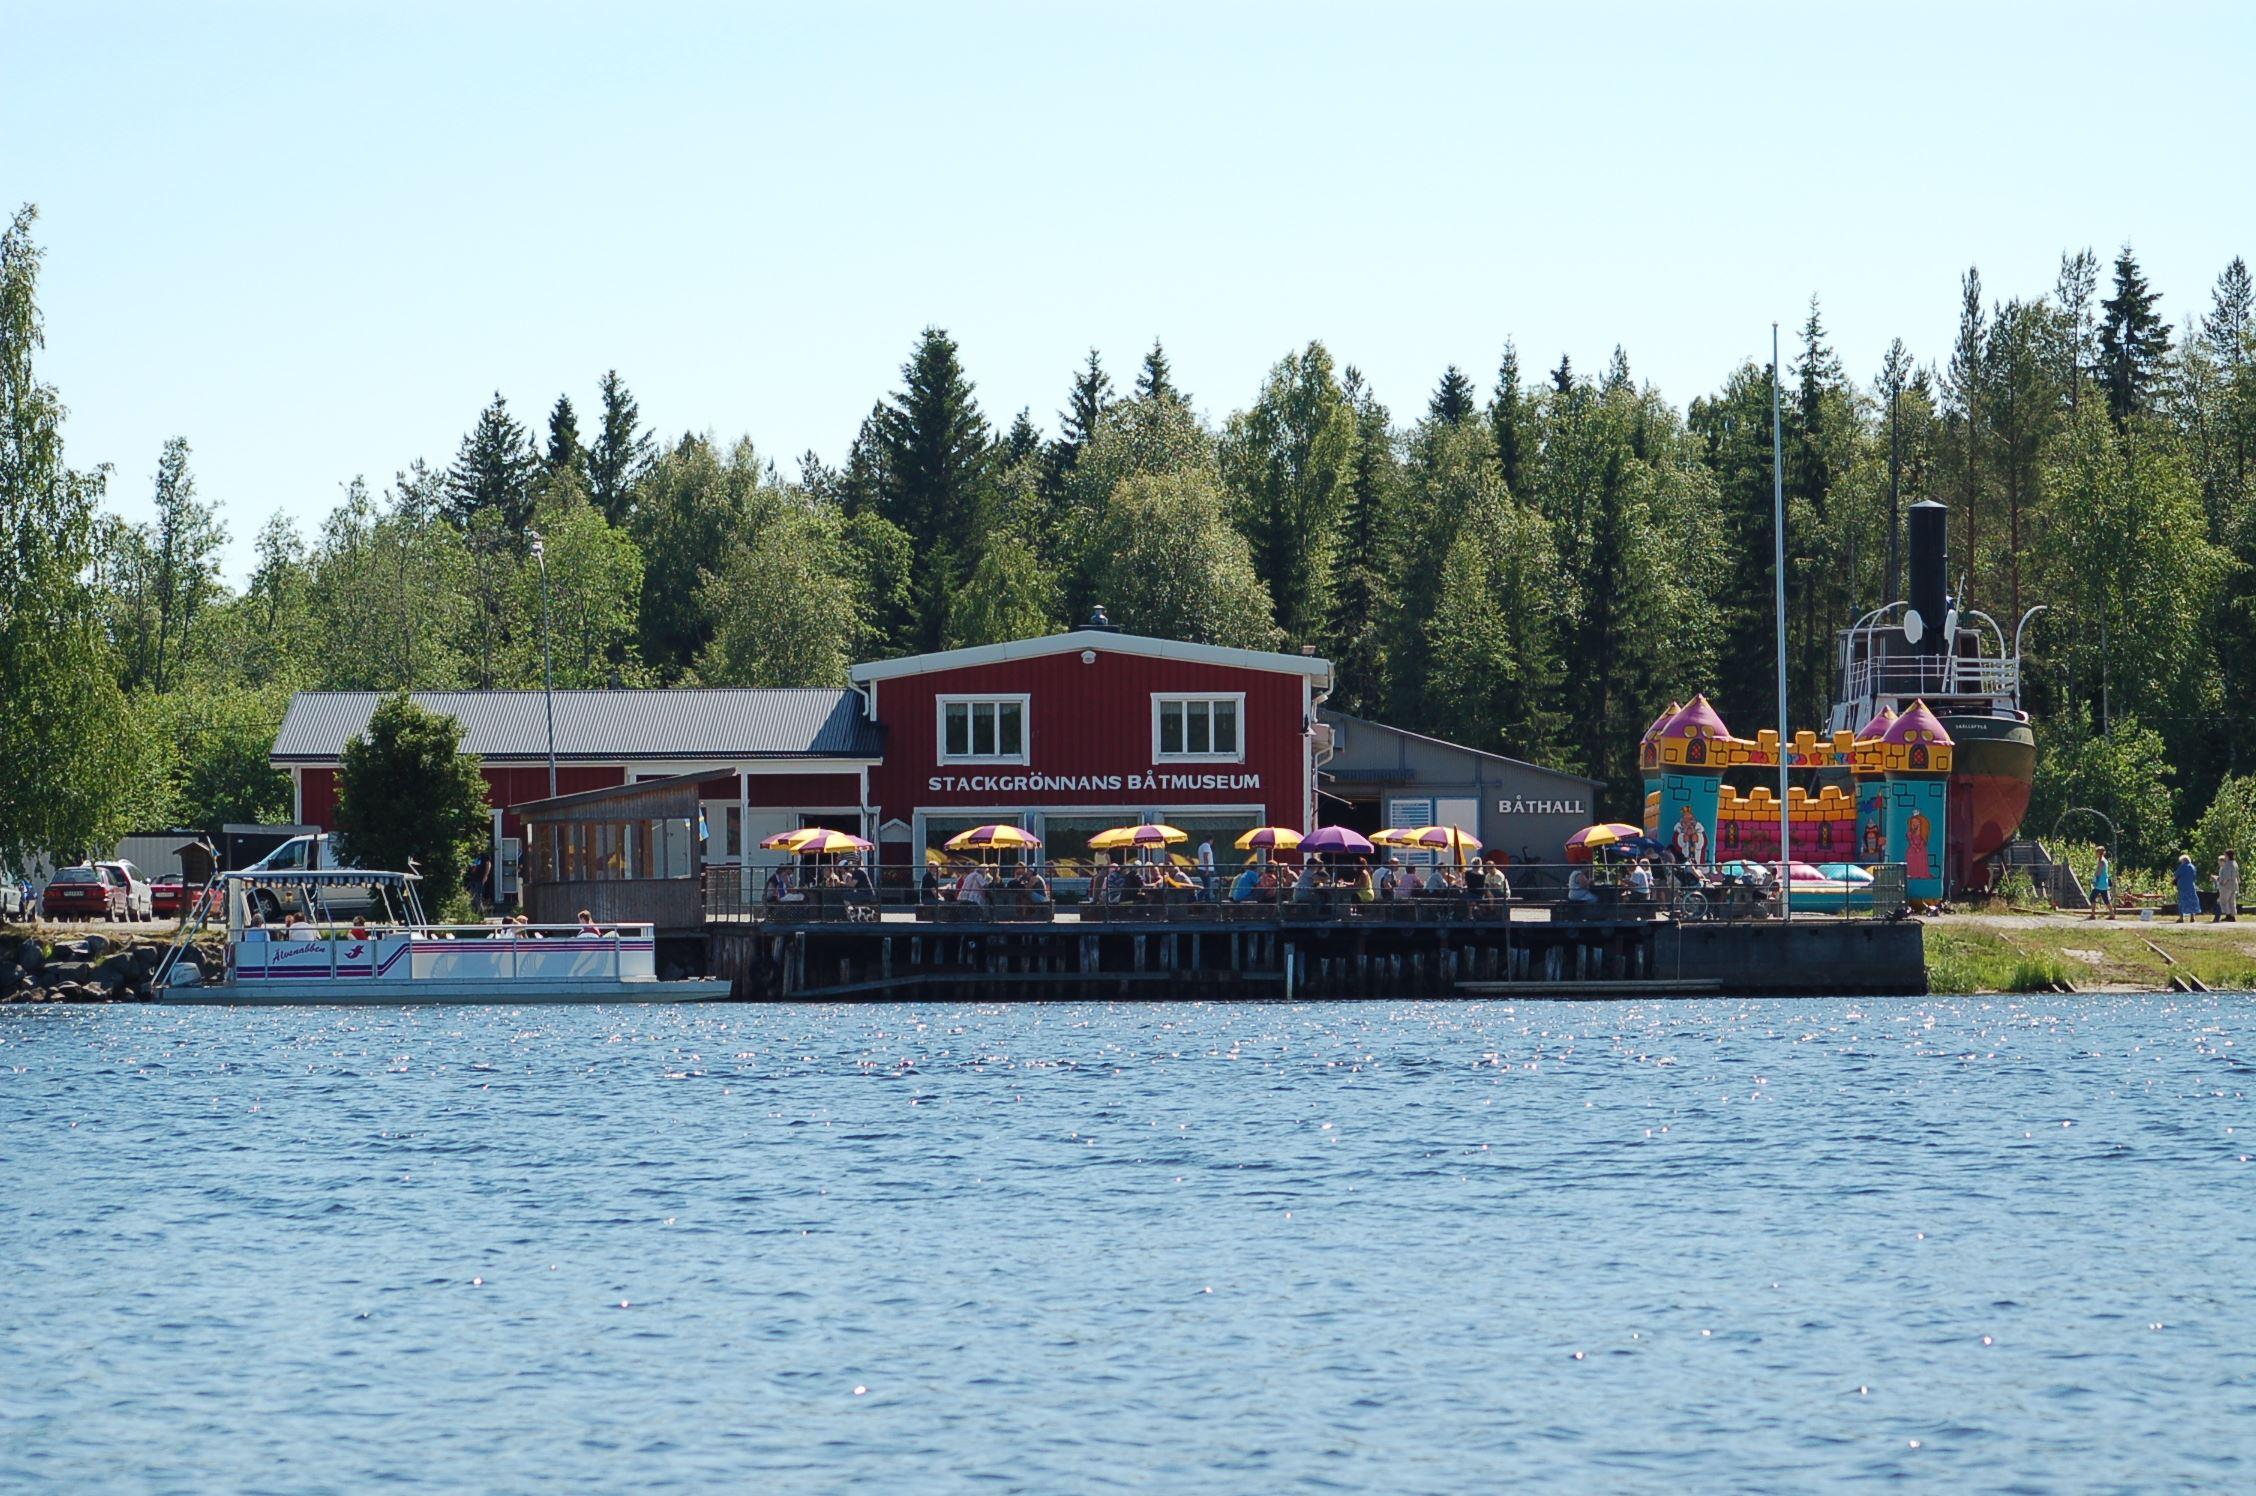 Stackgrönnans Boat Museum